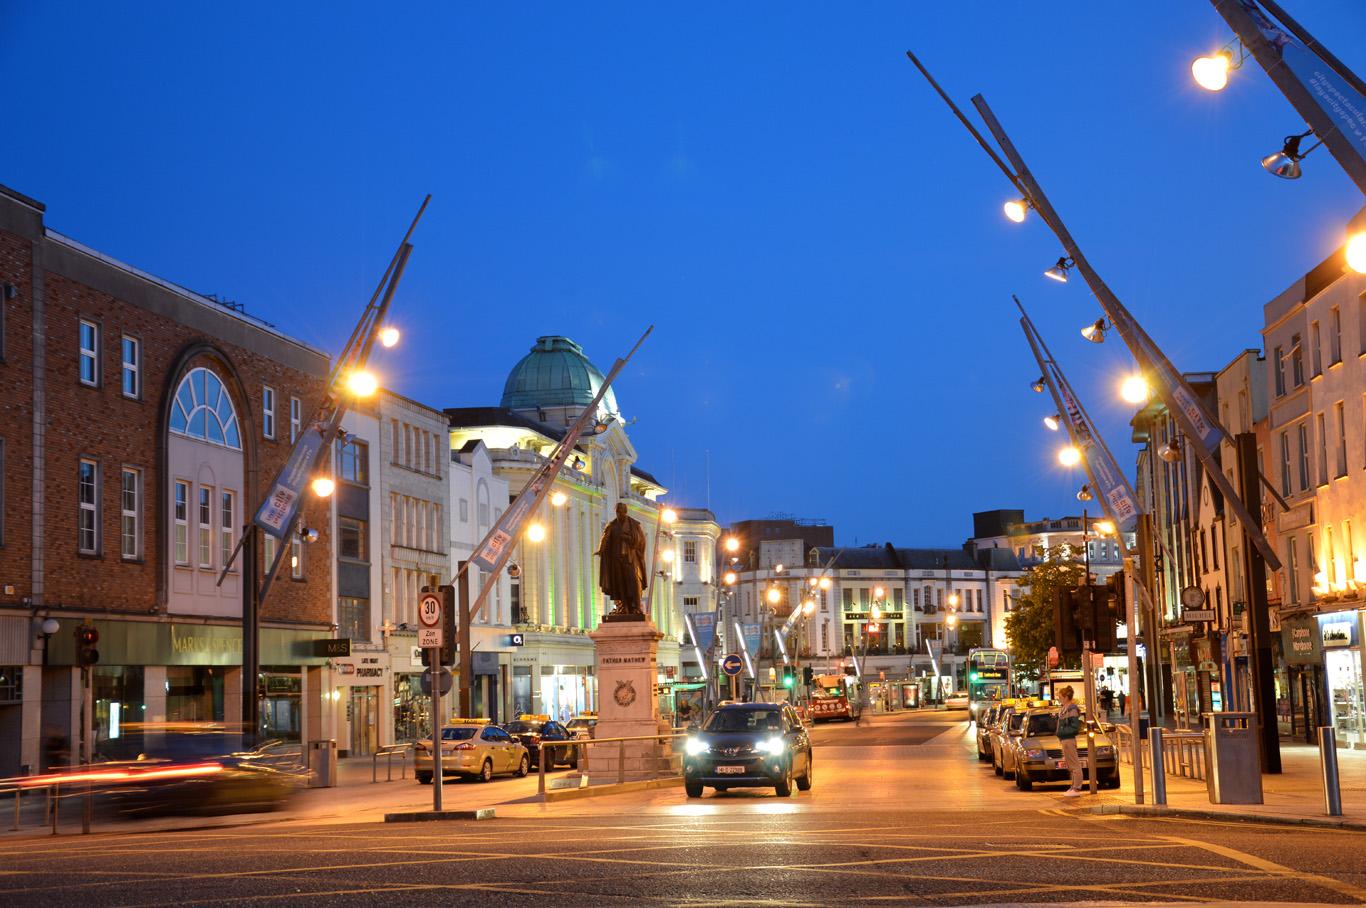 St. Patrick Street's at night